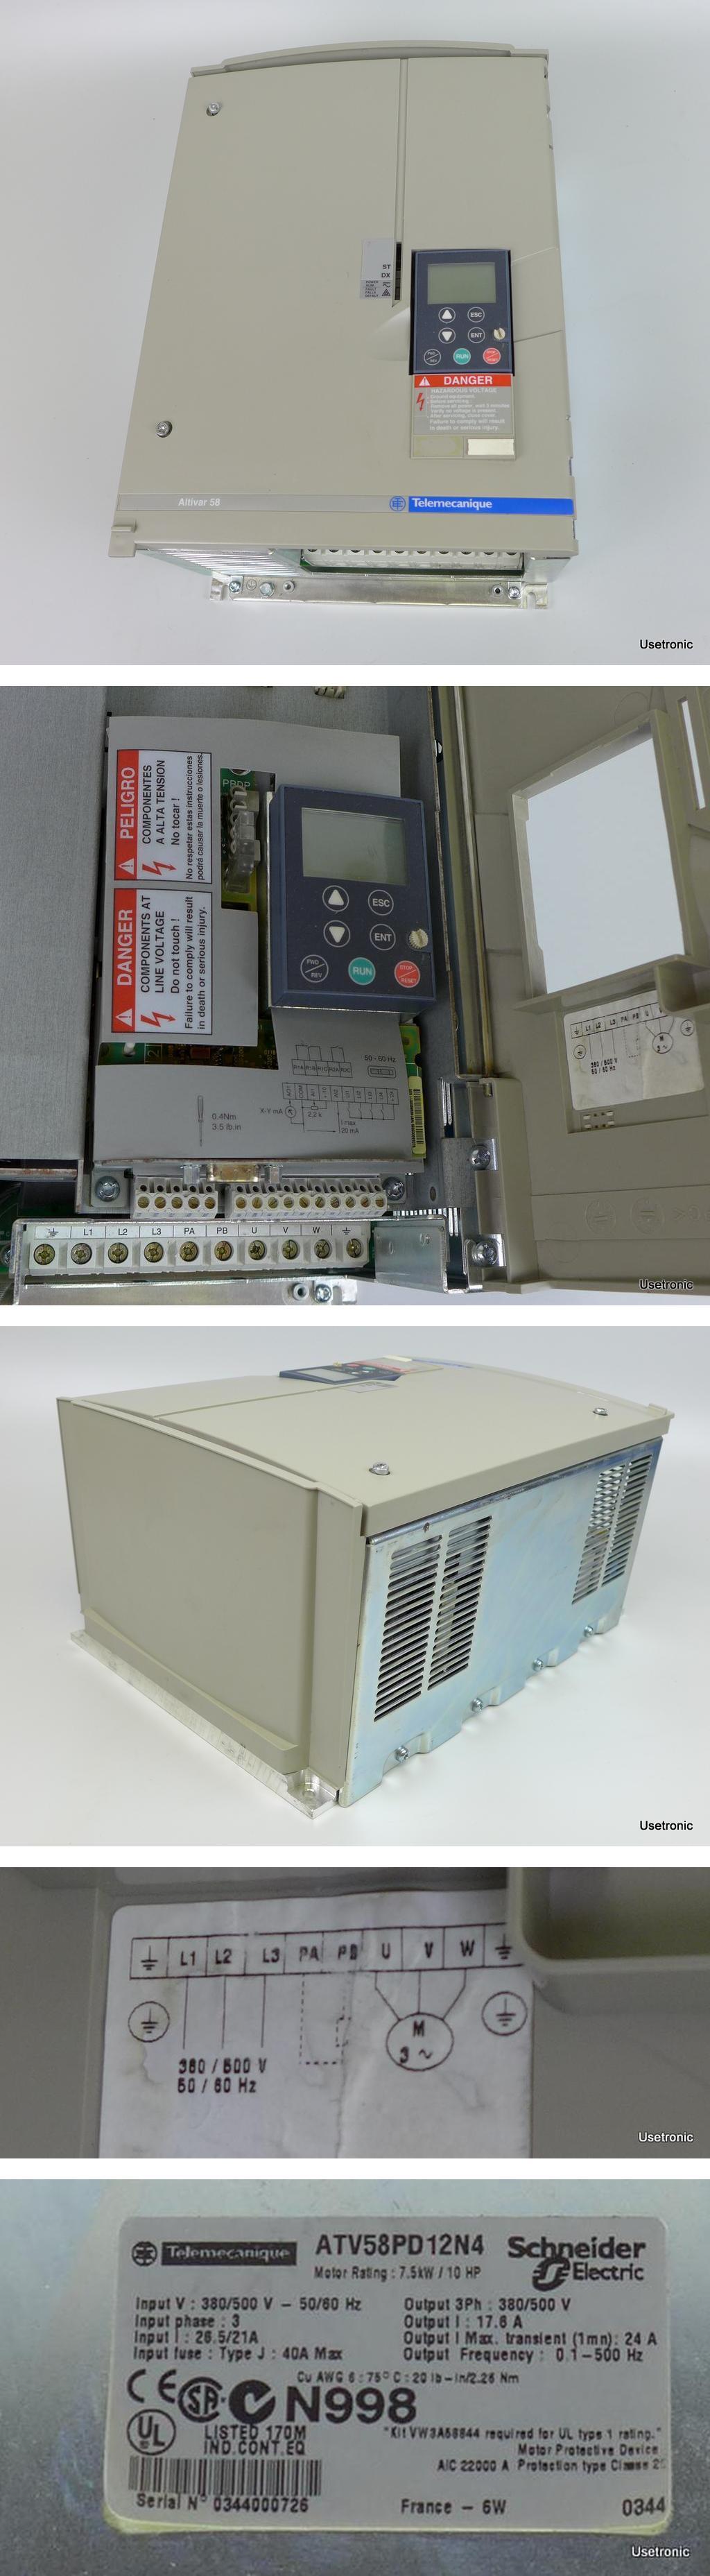 Telemecanique ATV58PD12N4